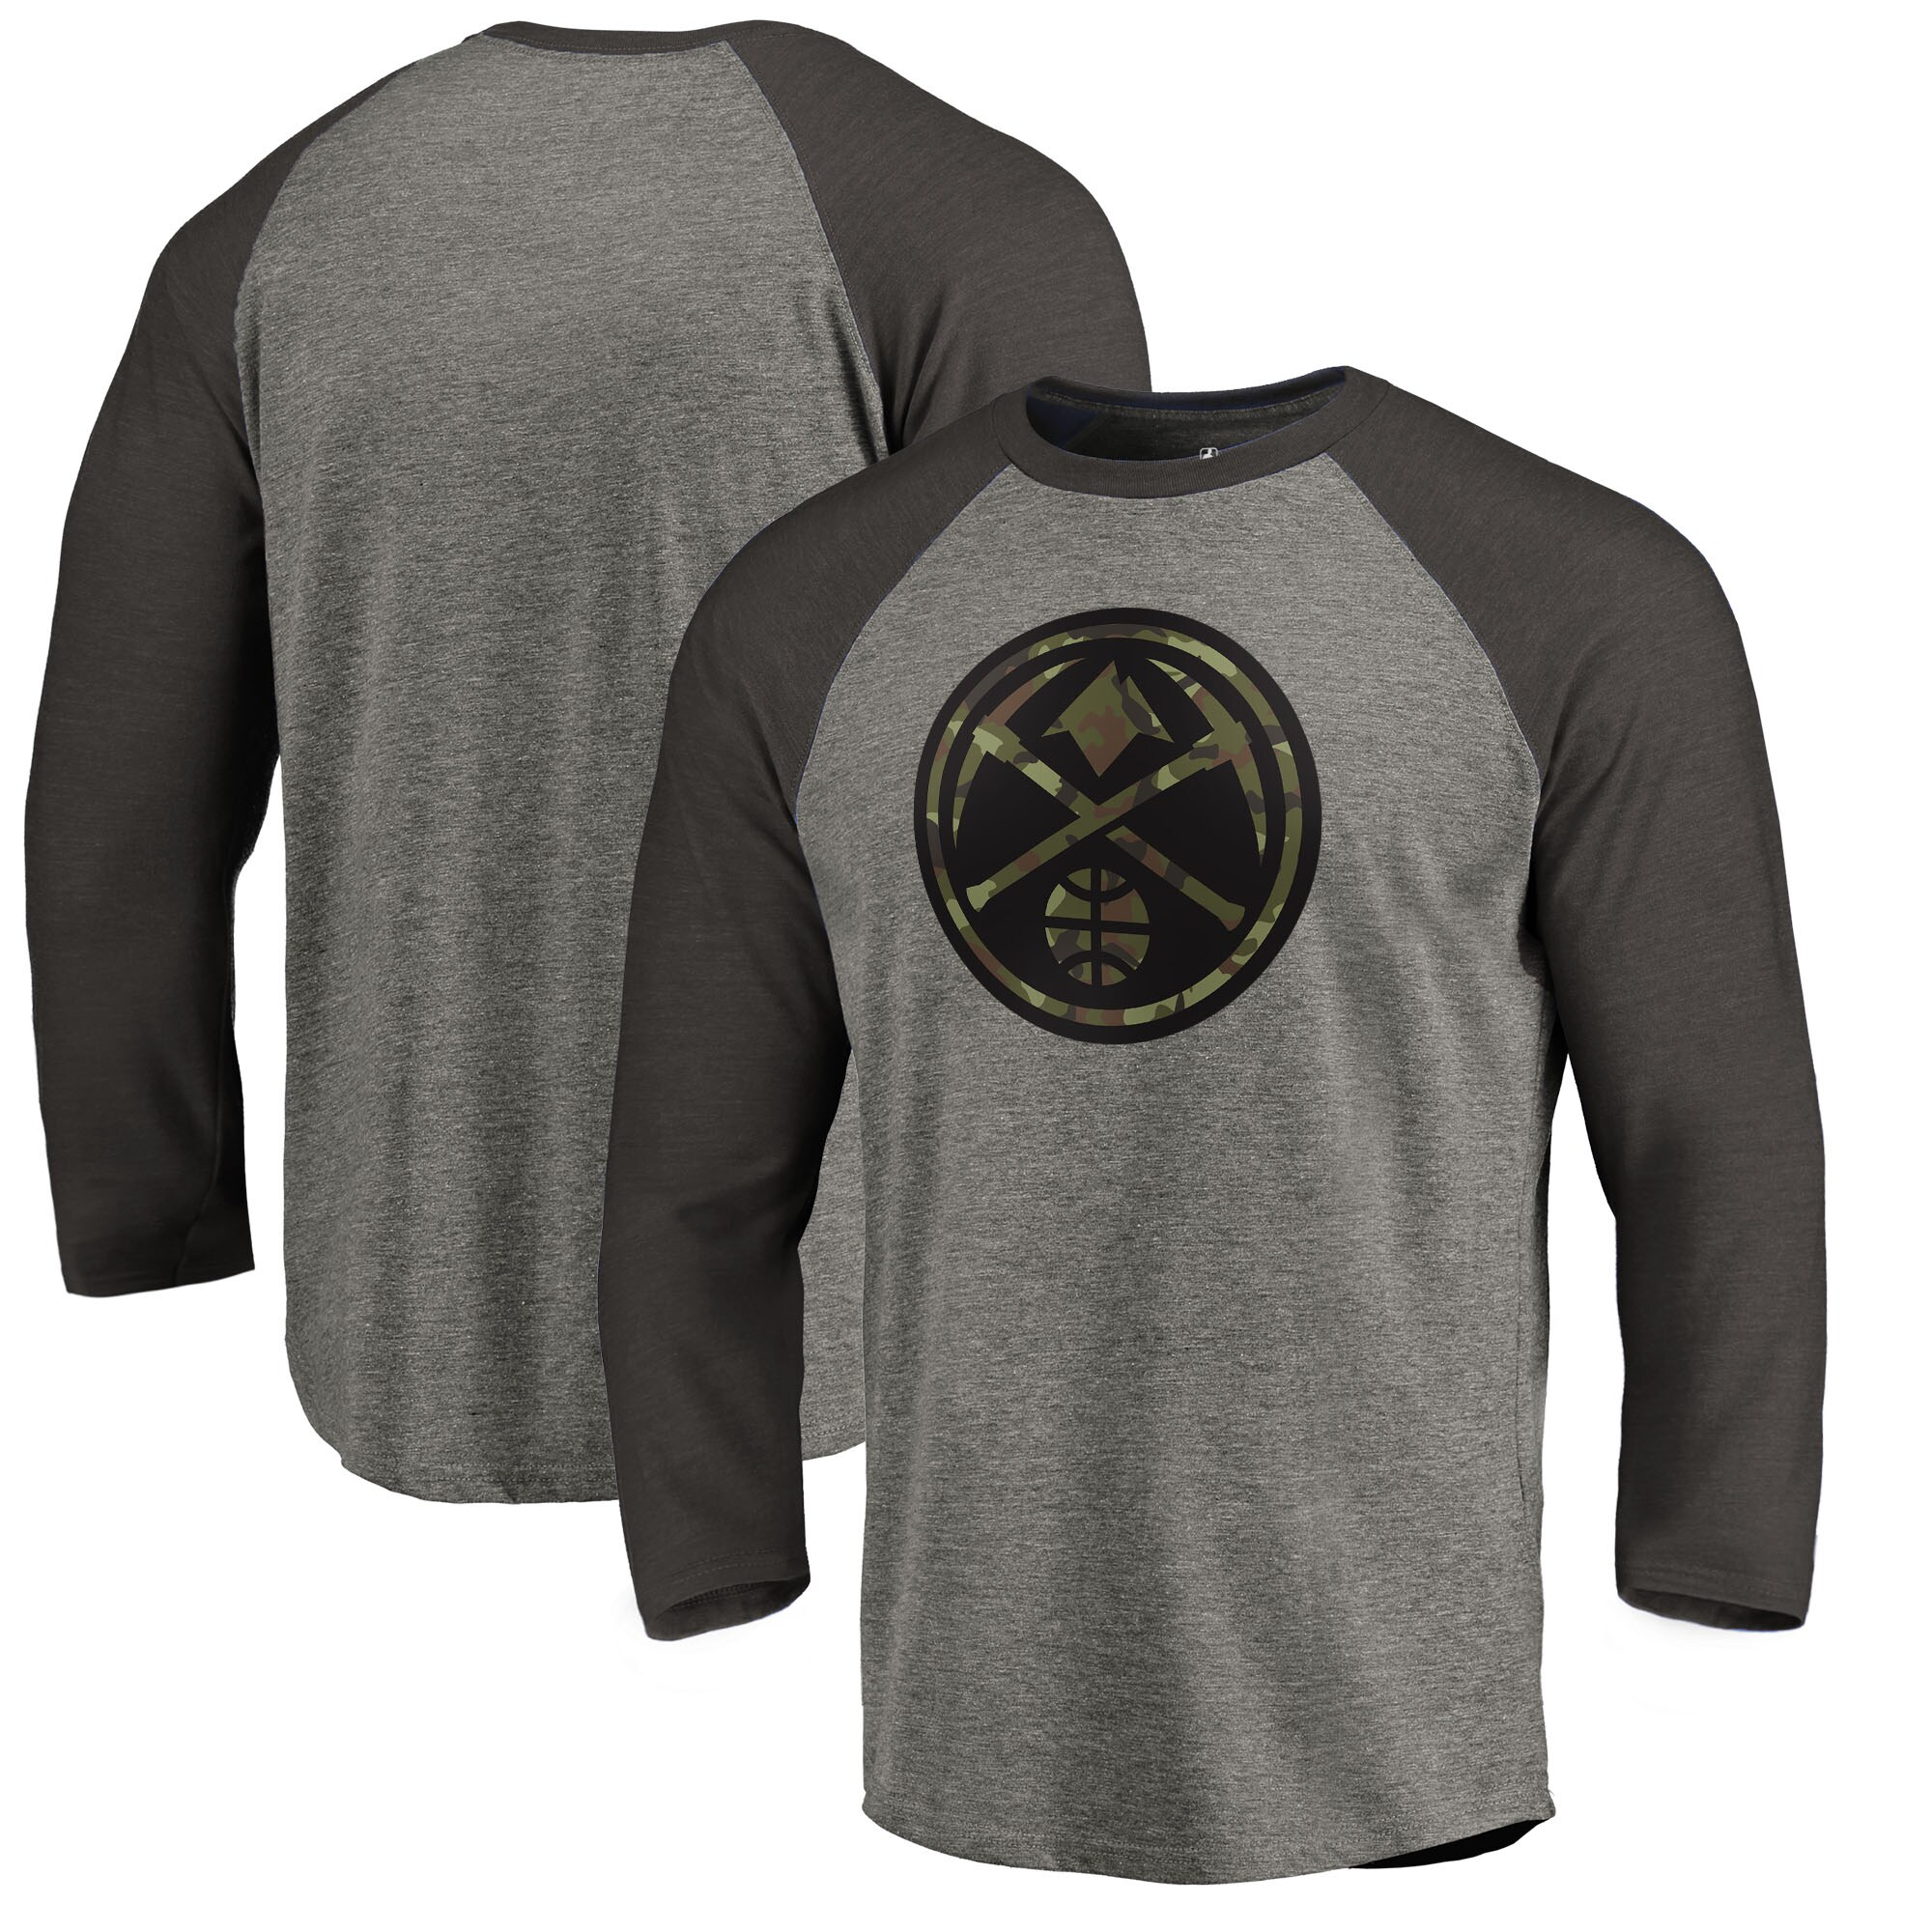 Denver Nuggets Fanatics Branded Camo Collection Prestige Raglan 3/4-Sleeve T-Shirt - Heather Gray